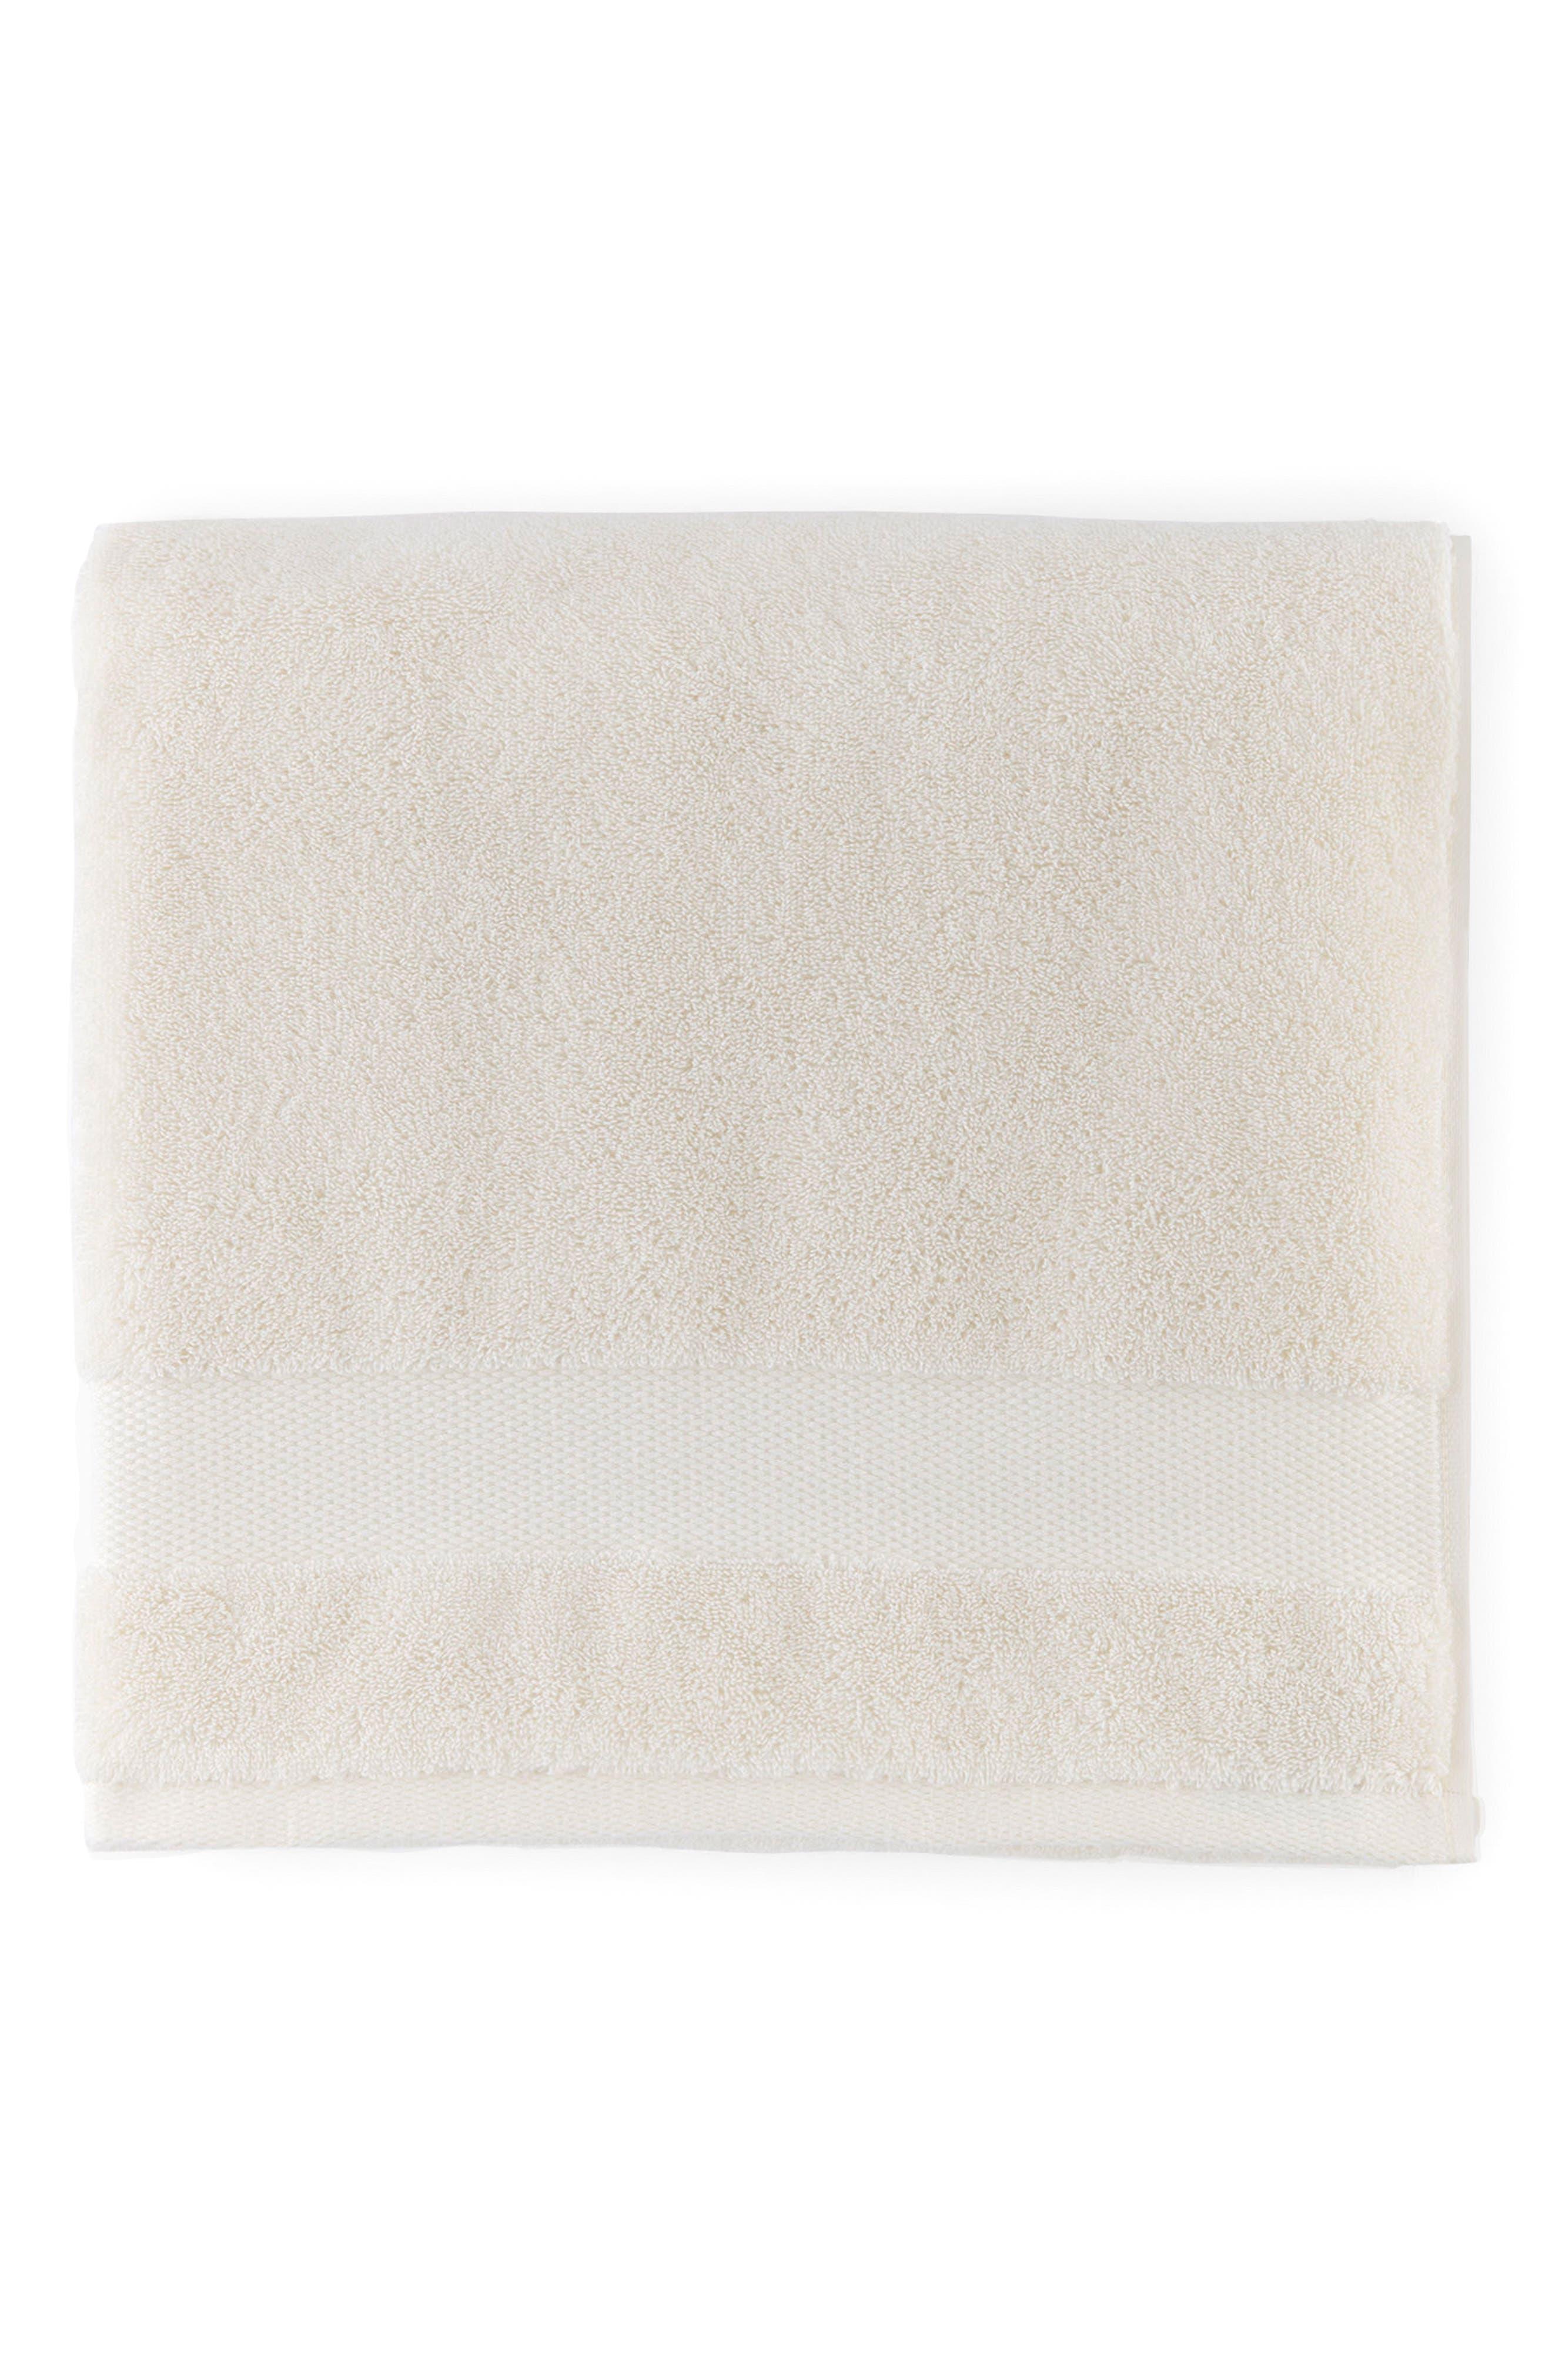 Main Image - SFERRA Bello Hand Towel